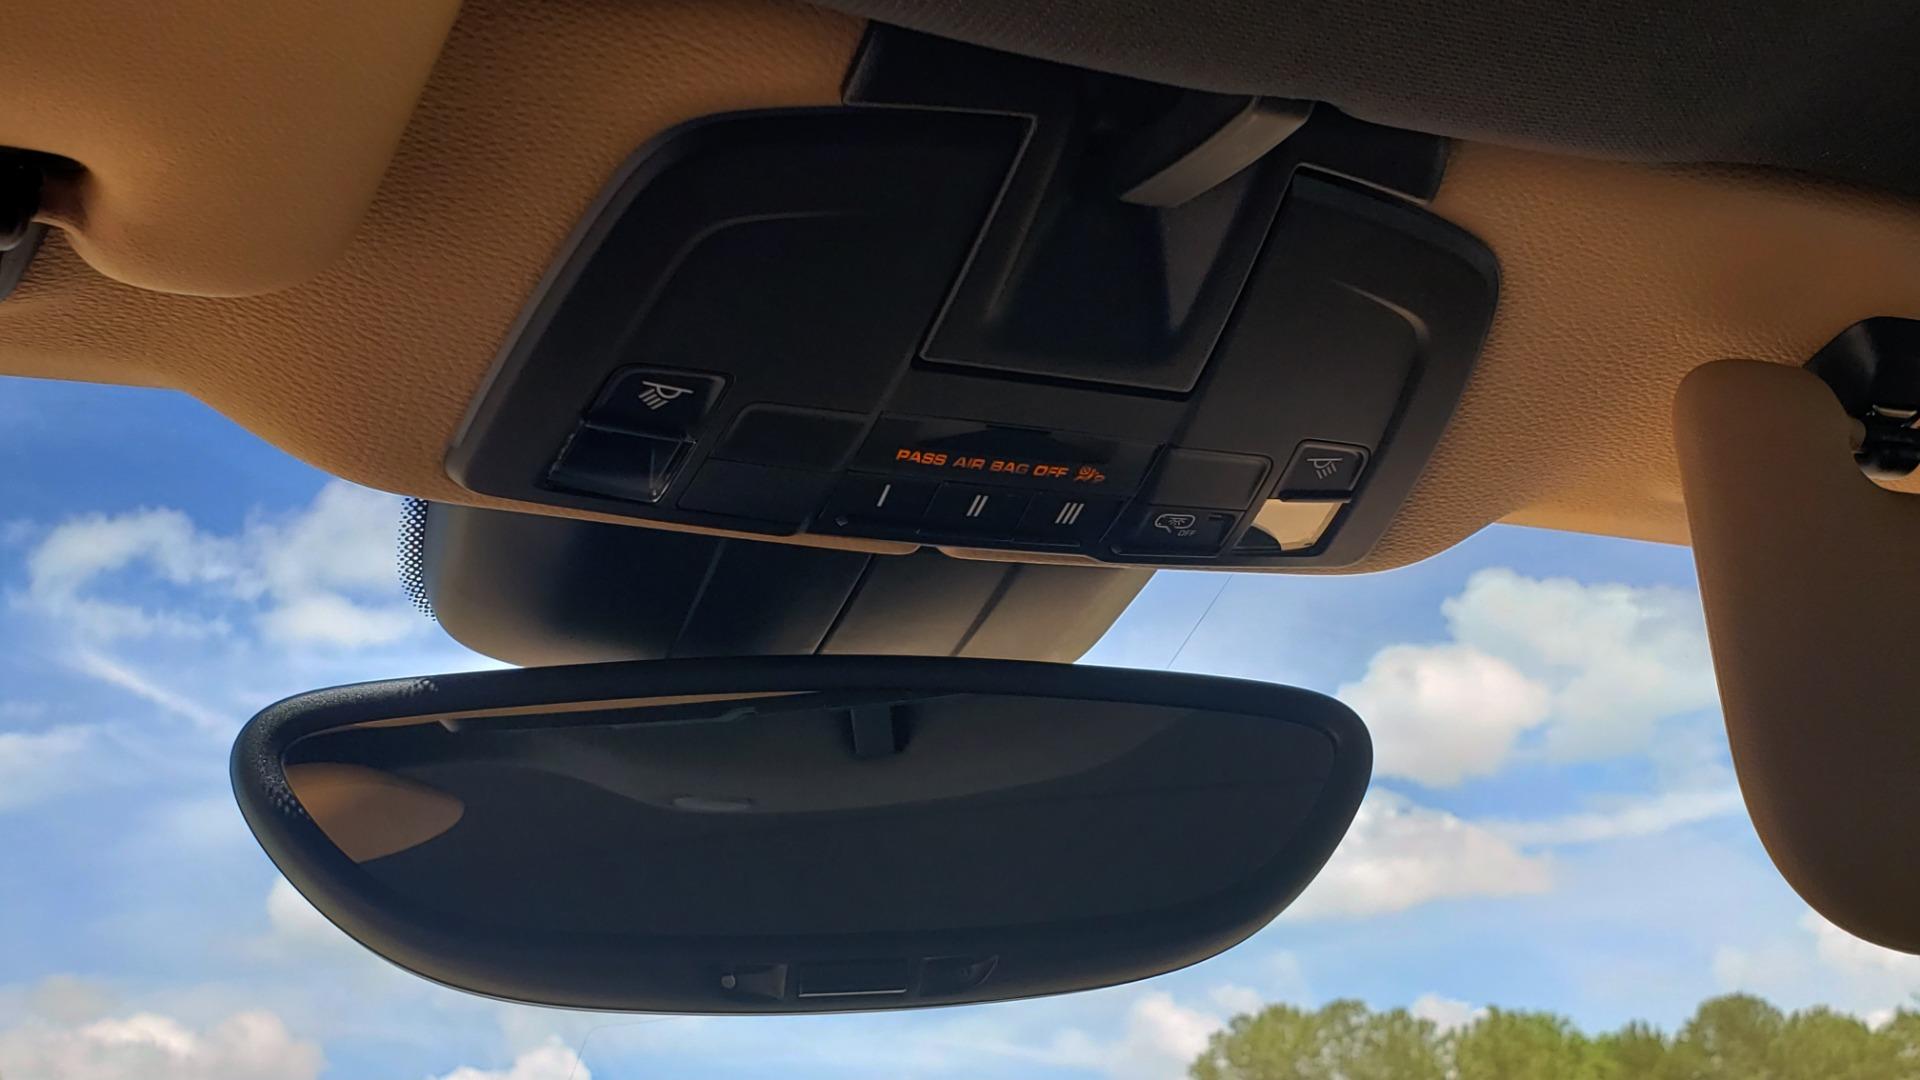 Used 2014 Porsche 911 CARRERA S CABRIOLET / PREM PKG / PDK / NAV / BOSE / SPORT CHRONO for sale $81,995 at Formula Imports in Charlotte NC 28227 64